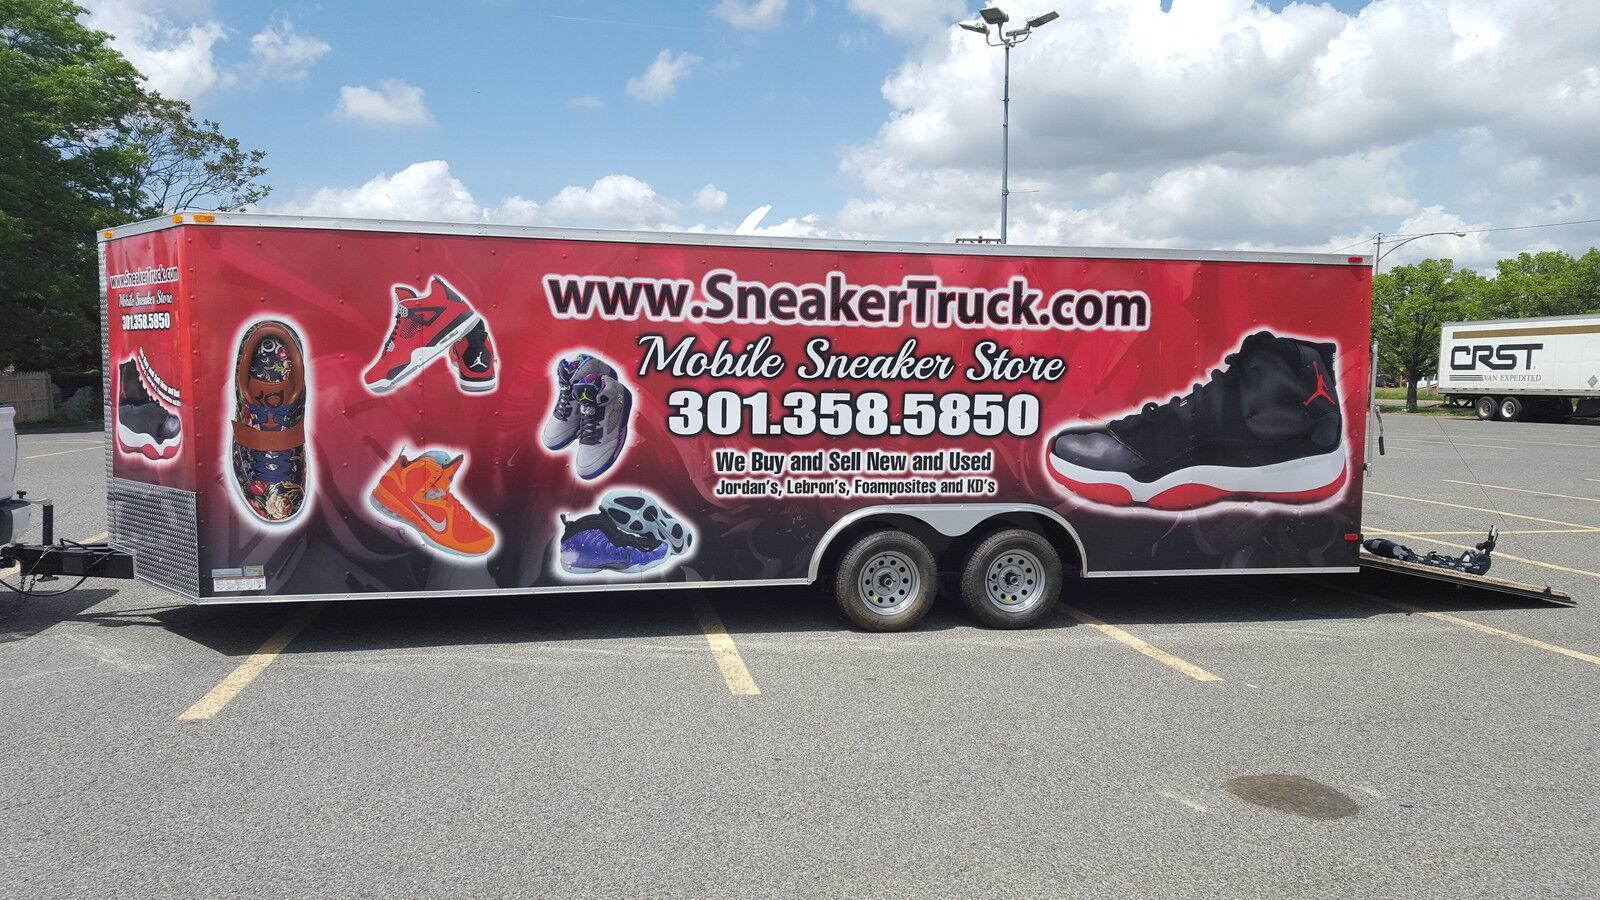 SneakerTruck.com 301-358-5850